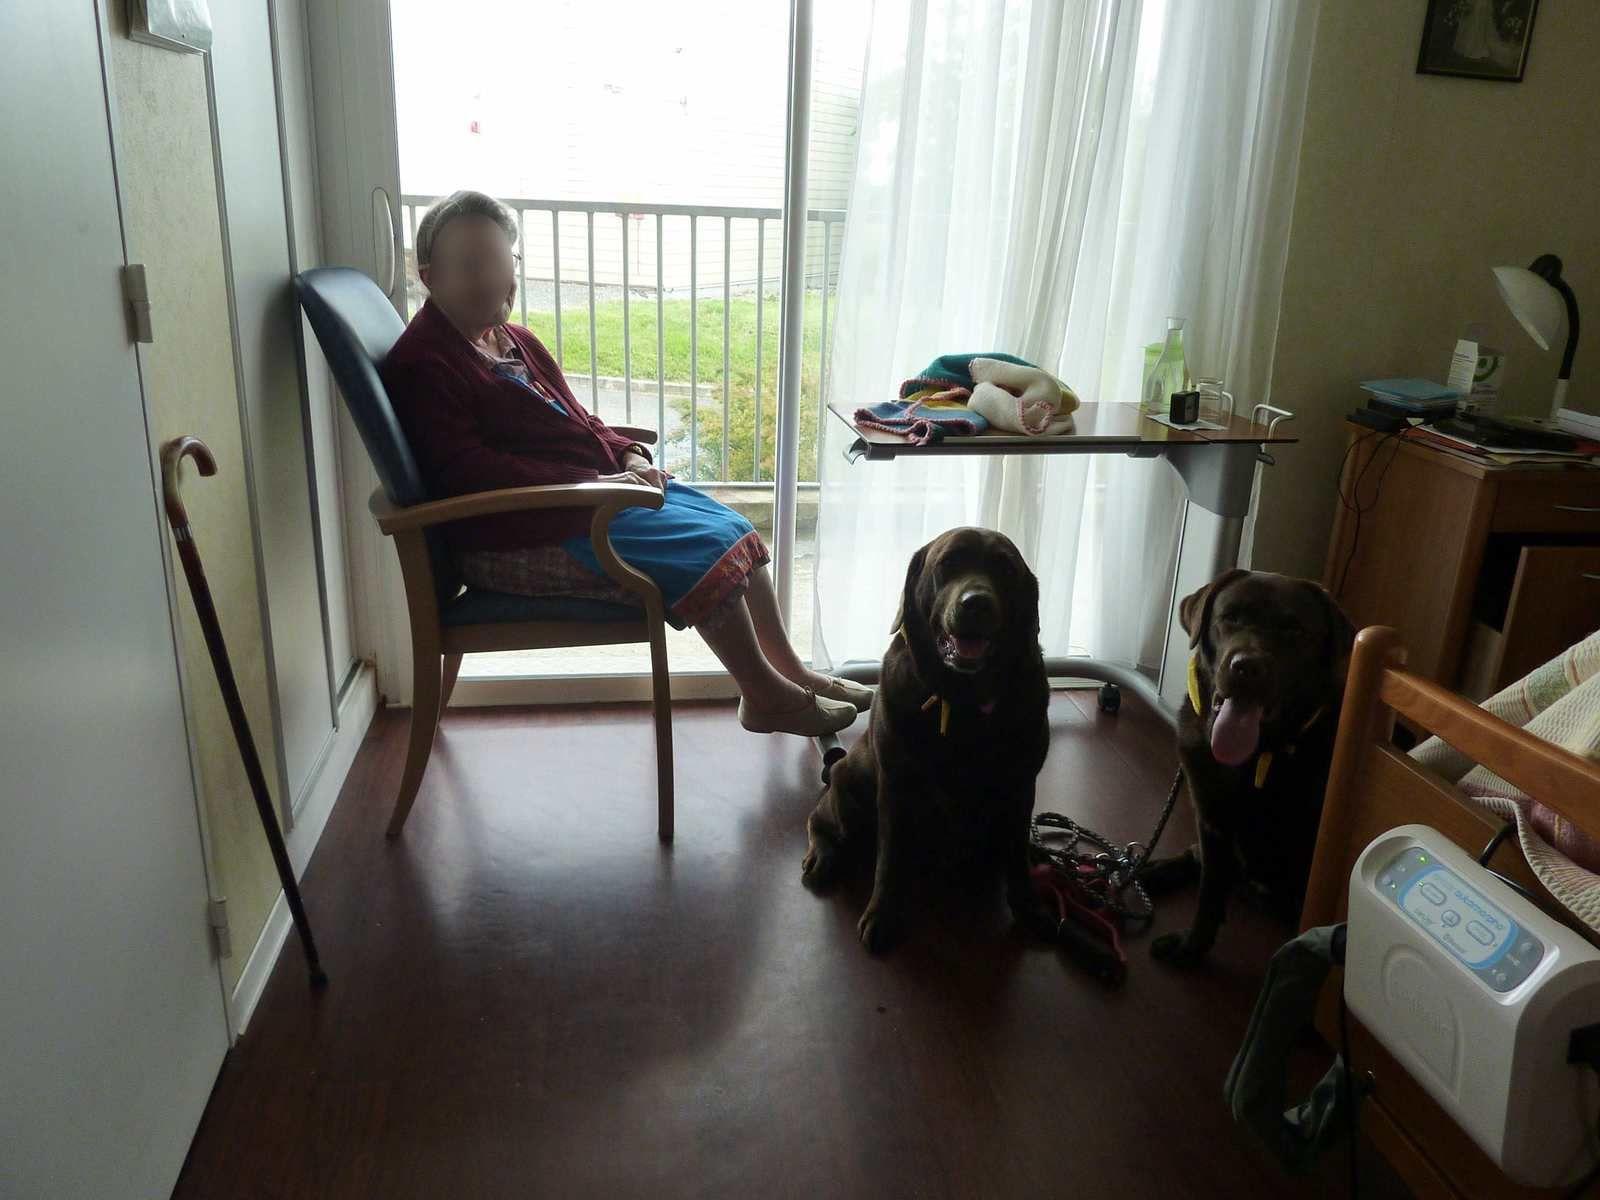 Visite de mai à la maison de retraite de Goûts.